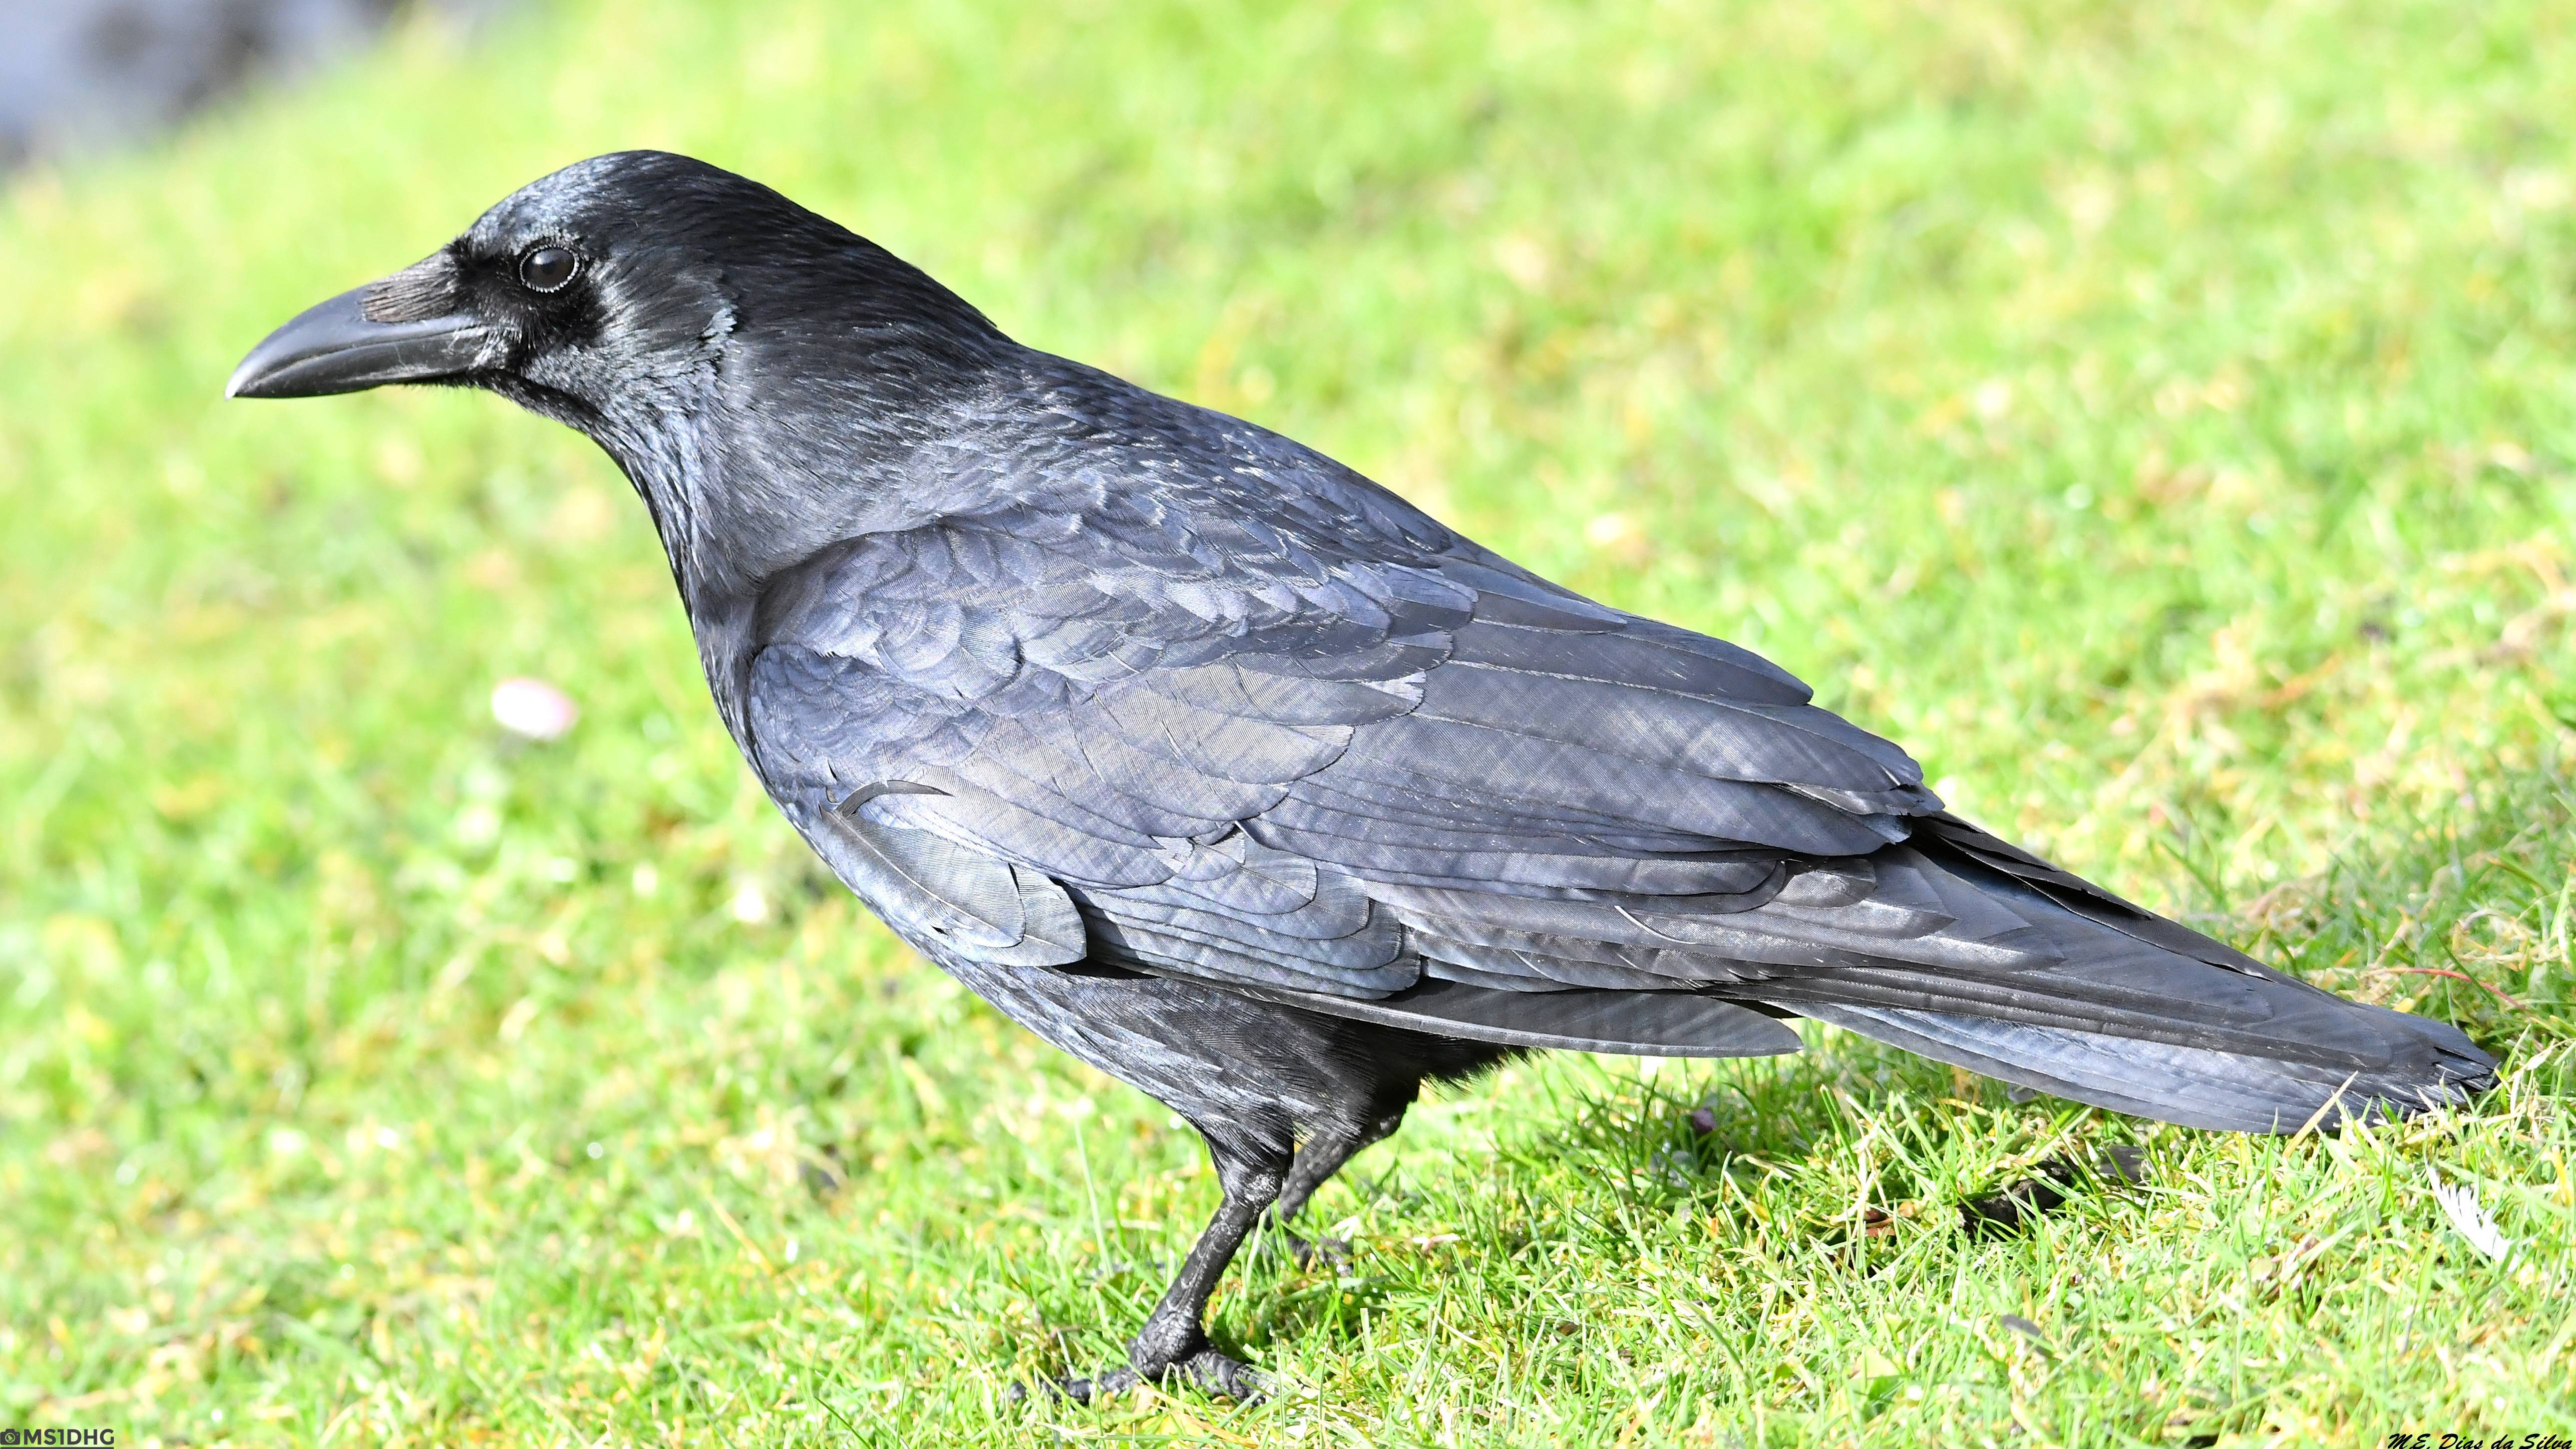 Fórum Aves - Birdwatching em Portugal - Portal Gralha-preta%20(23)